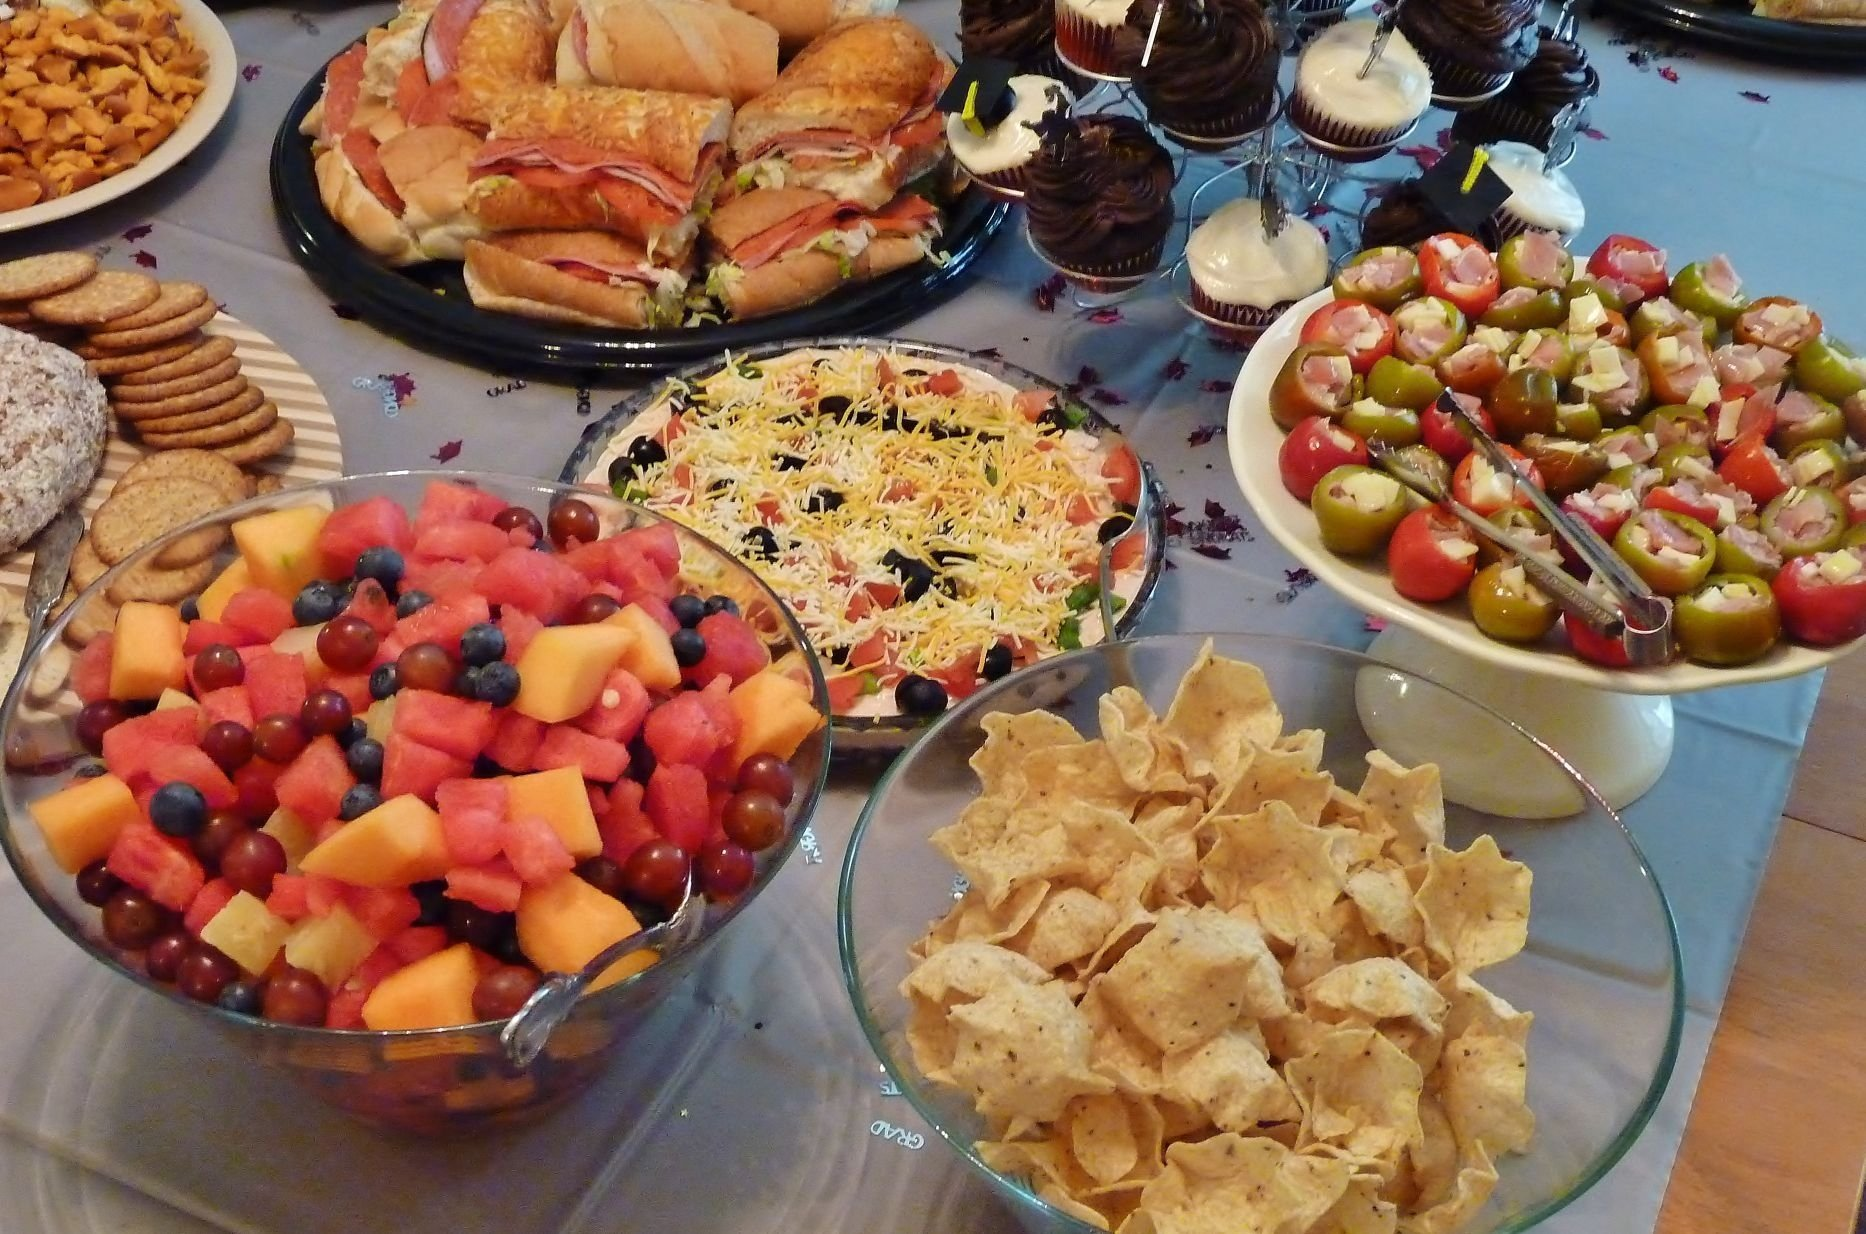 10 Stylish Graduation Open House Menu Ideas 88 food ideas graduation open house graduation party food ideas 2021